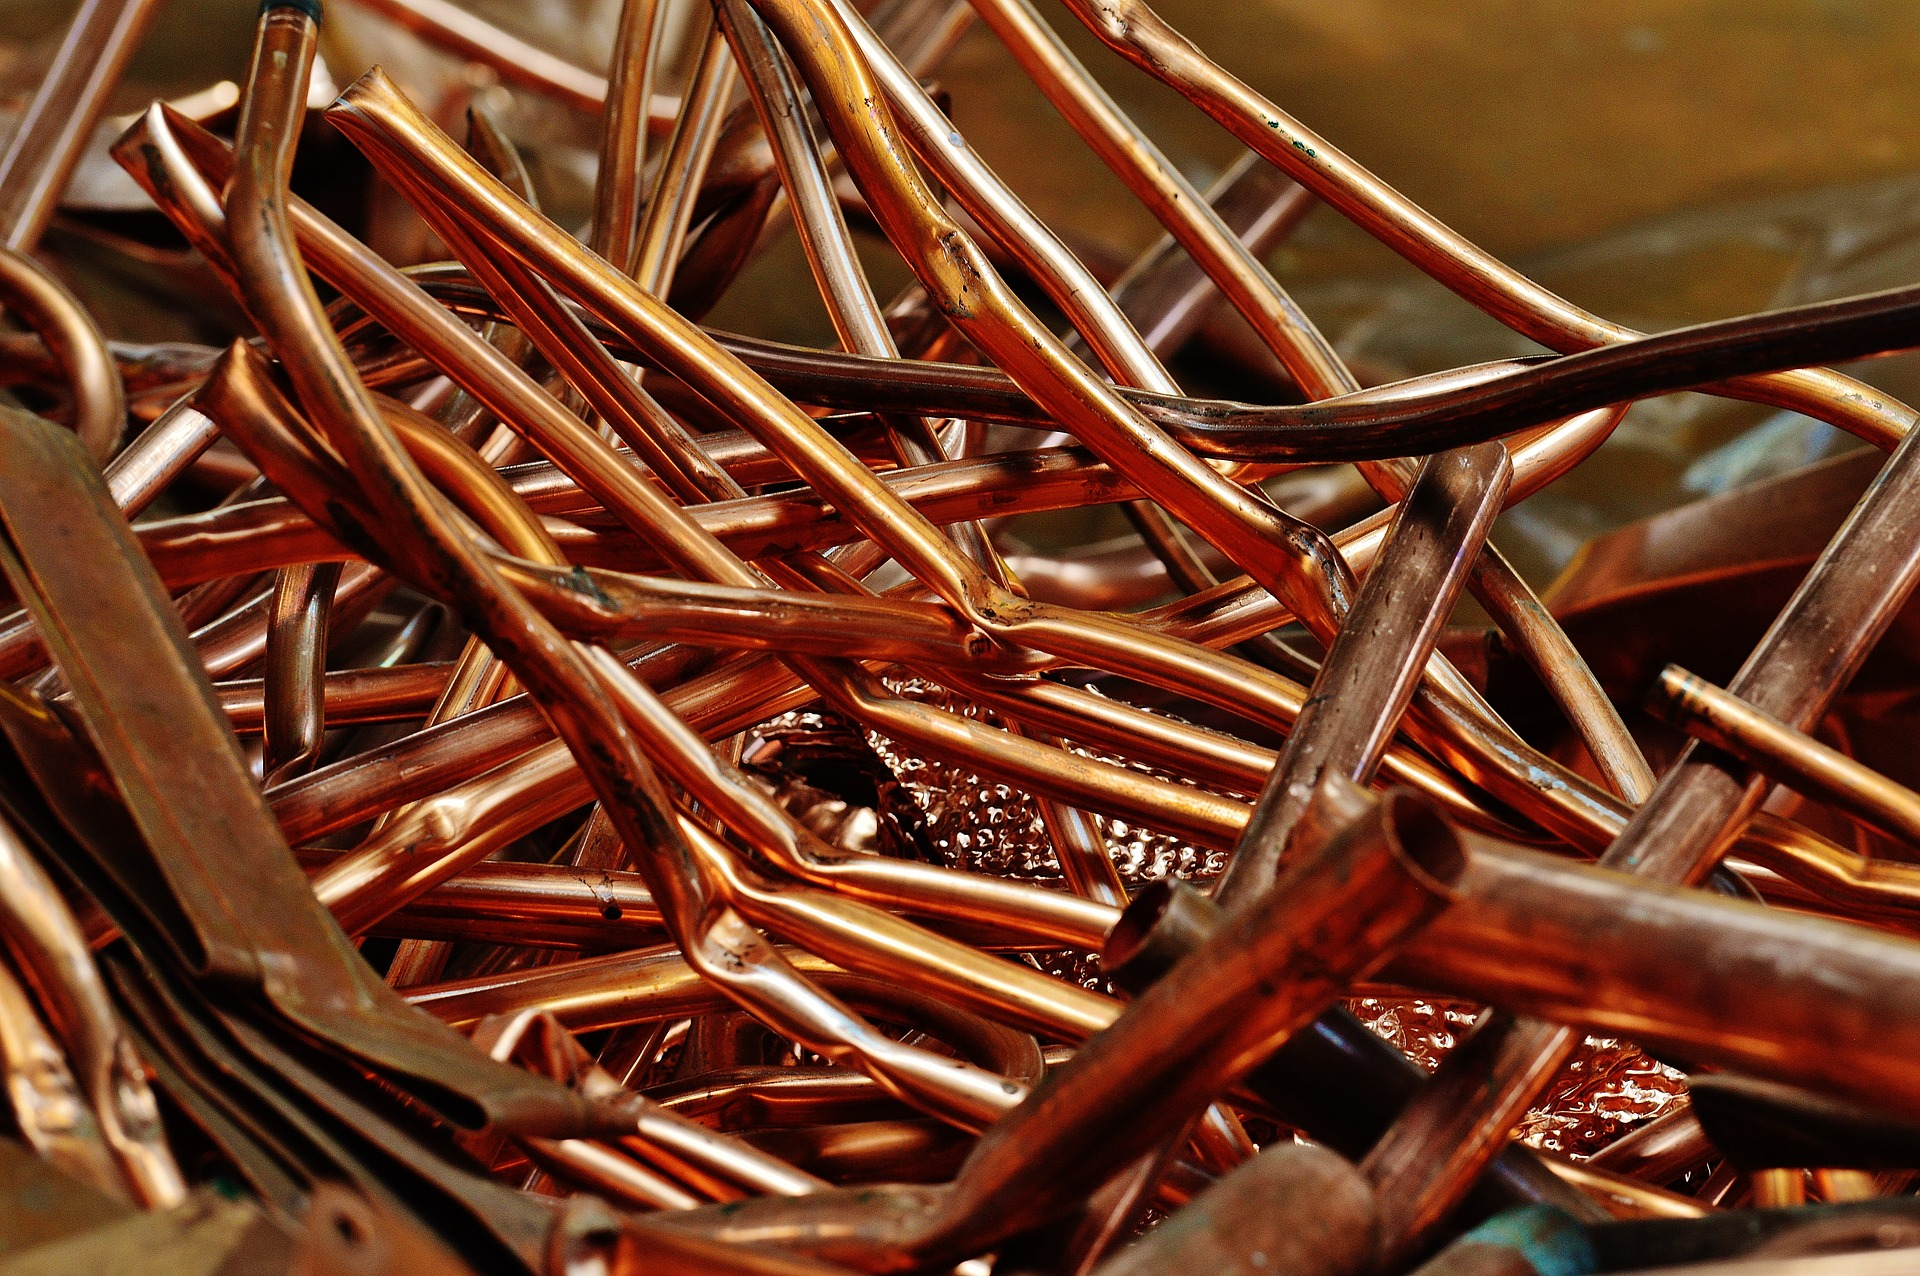 copper-1504098_1920.jpg